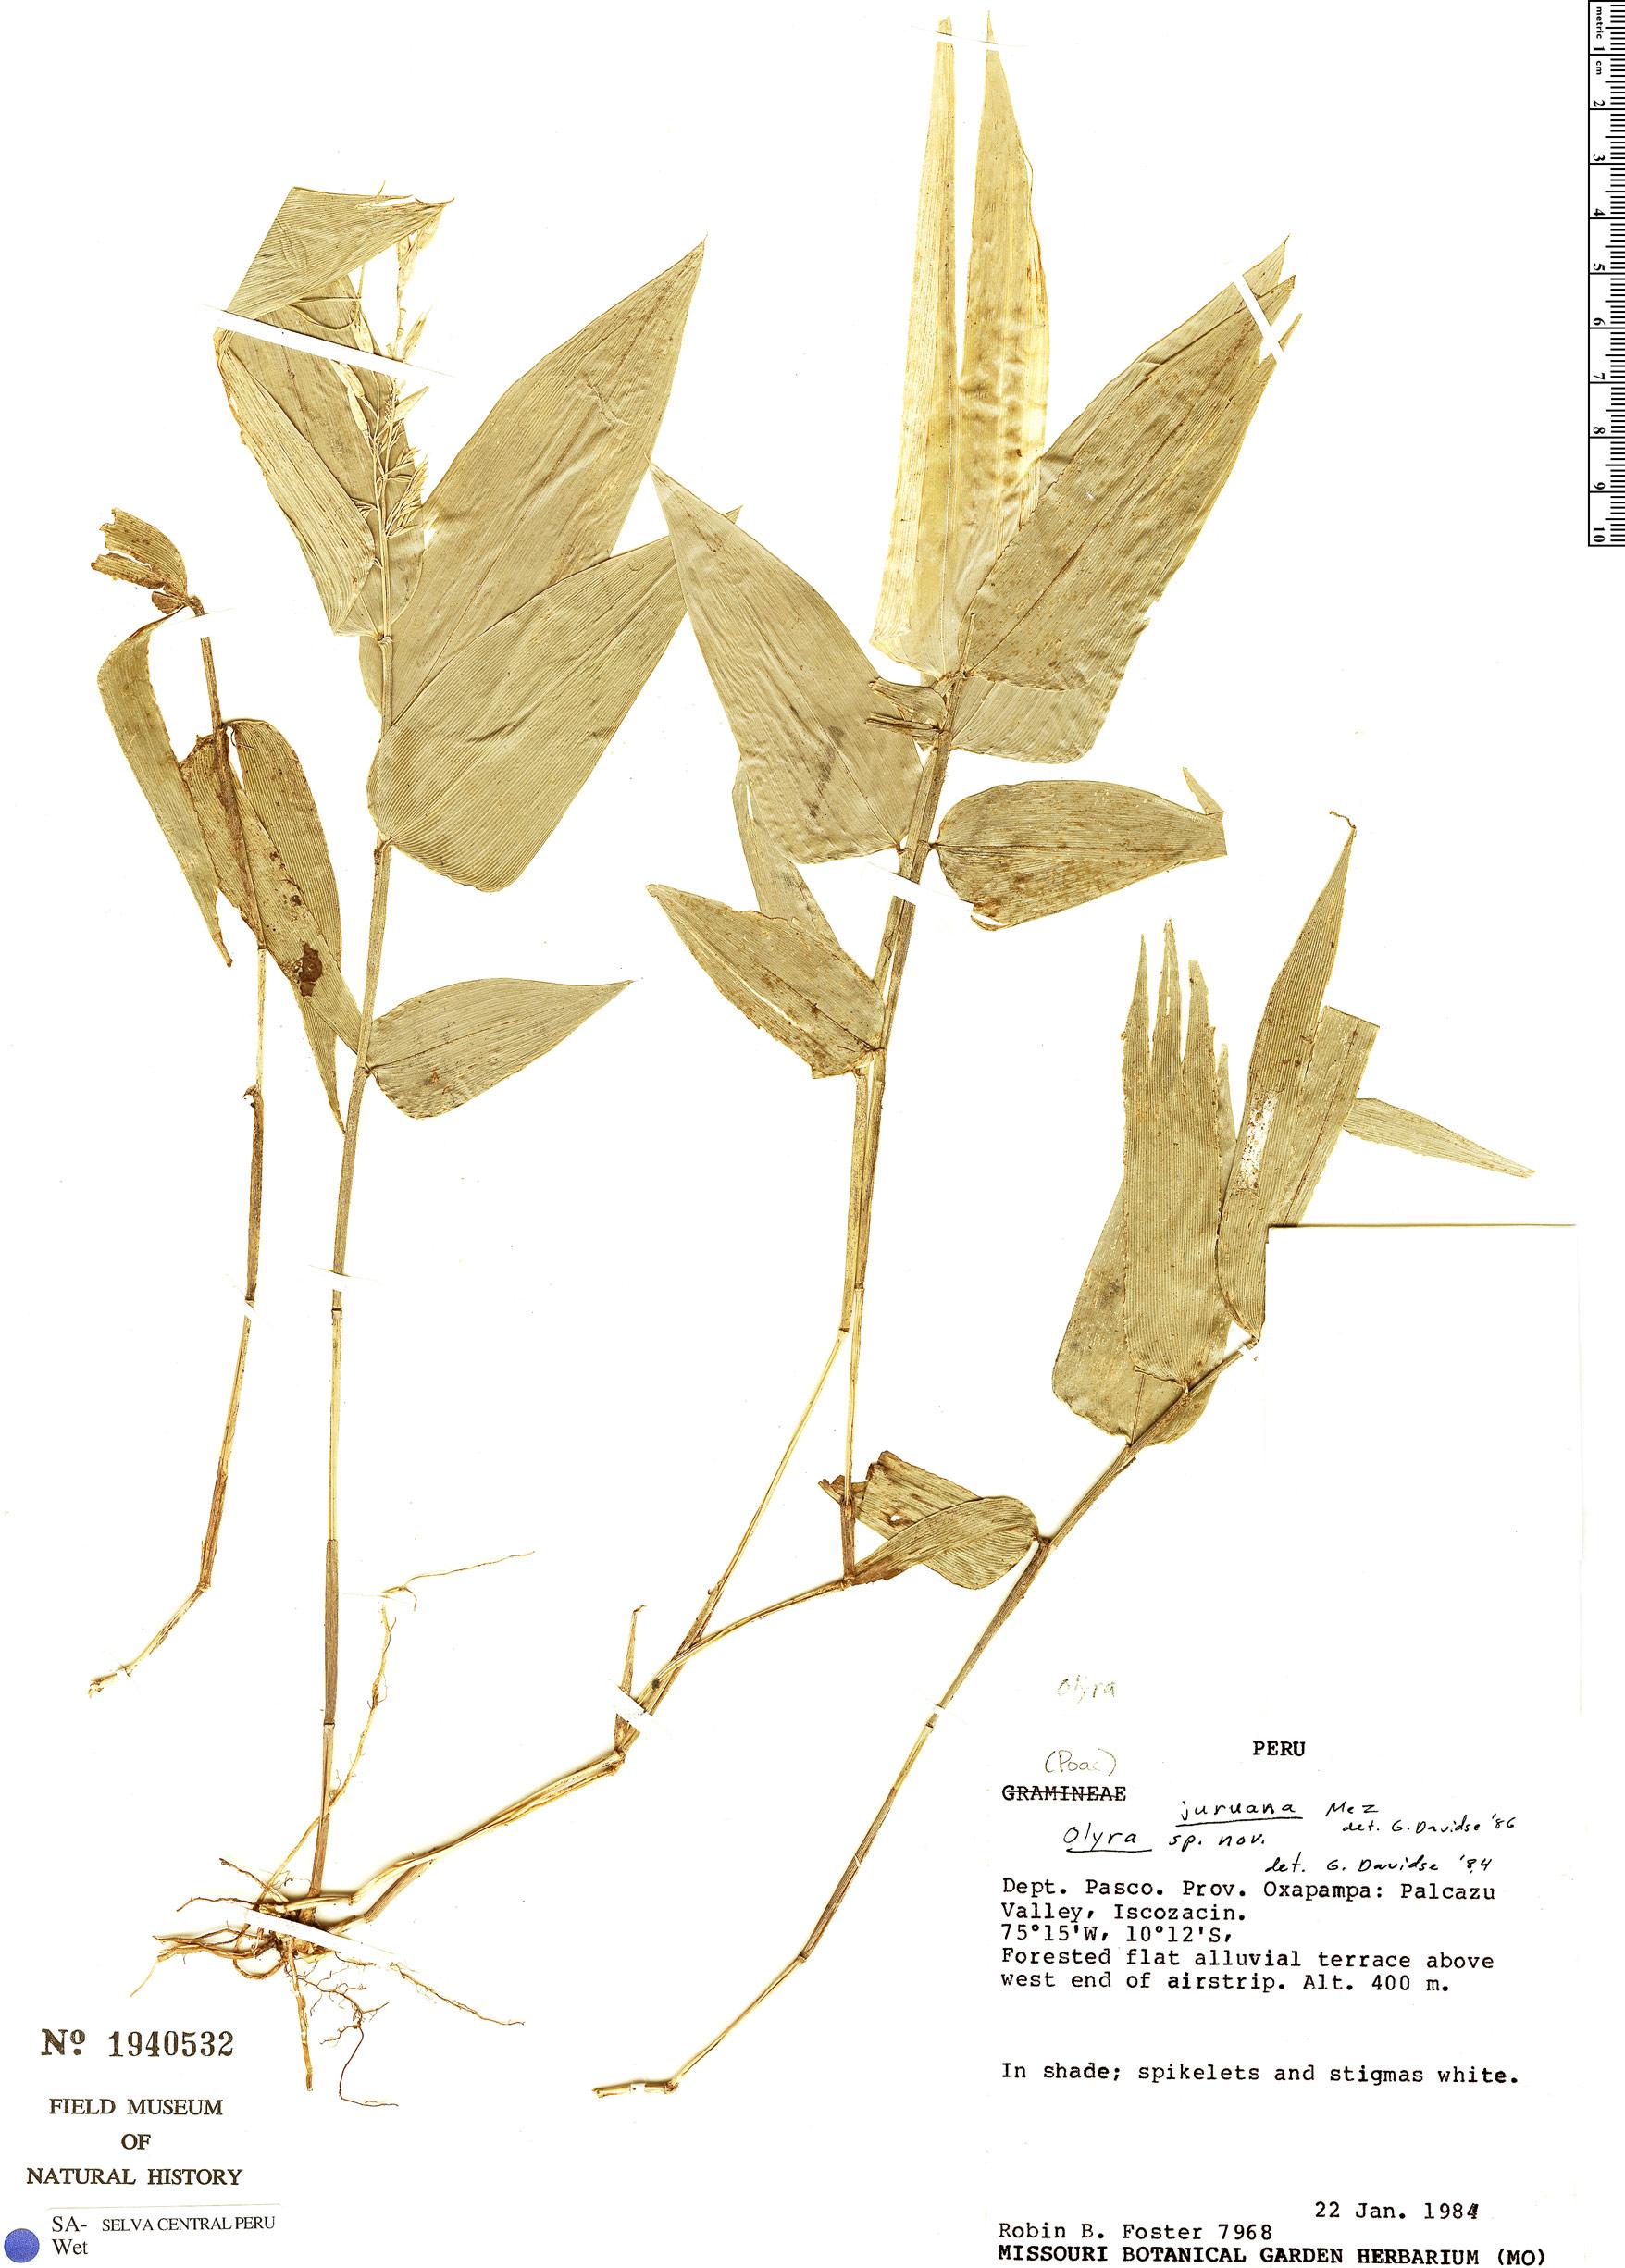 Specimen: Olyra juruana